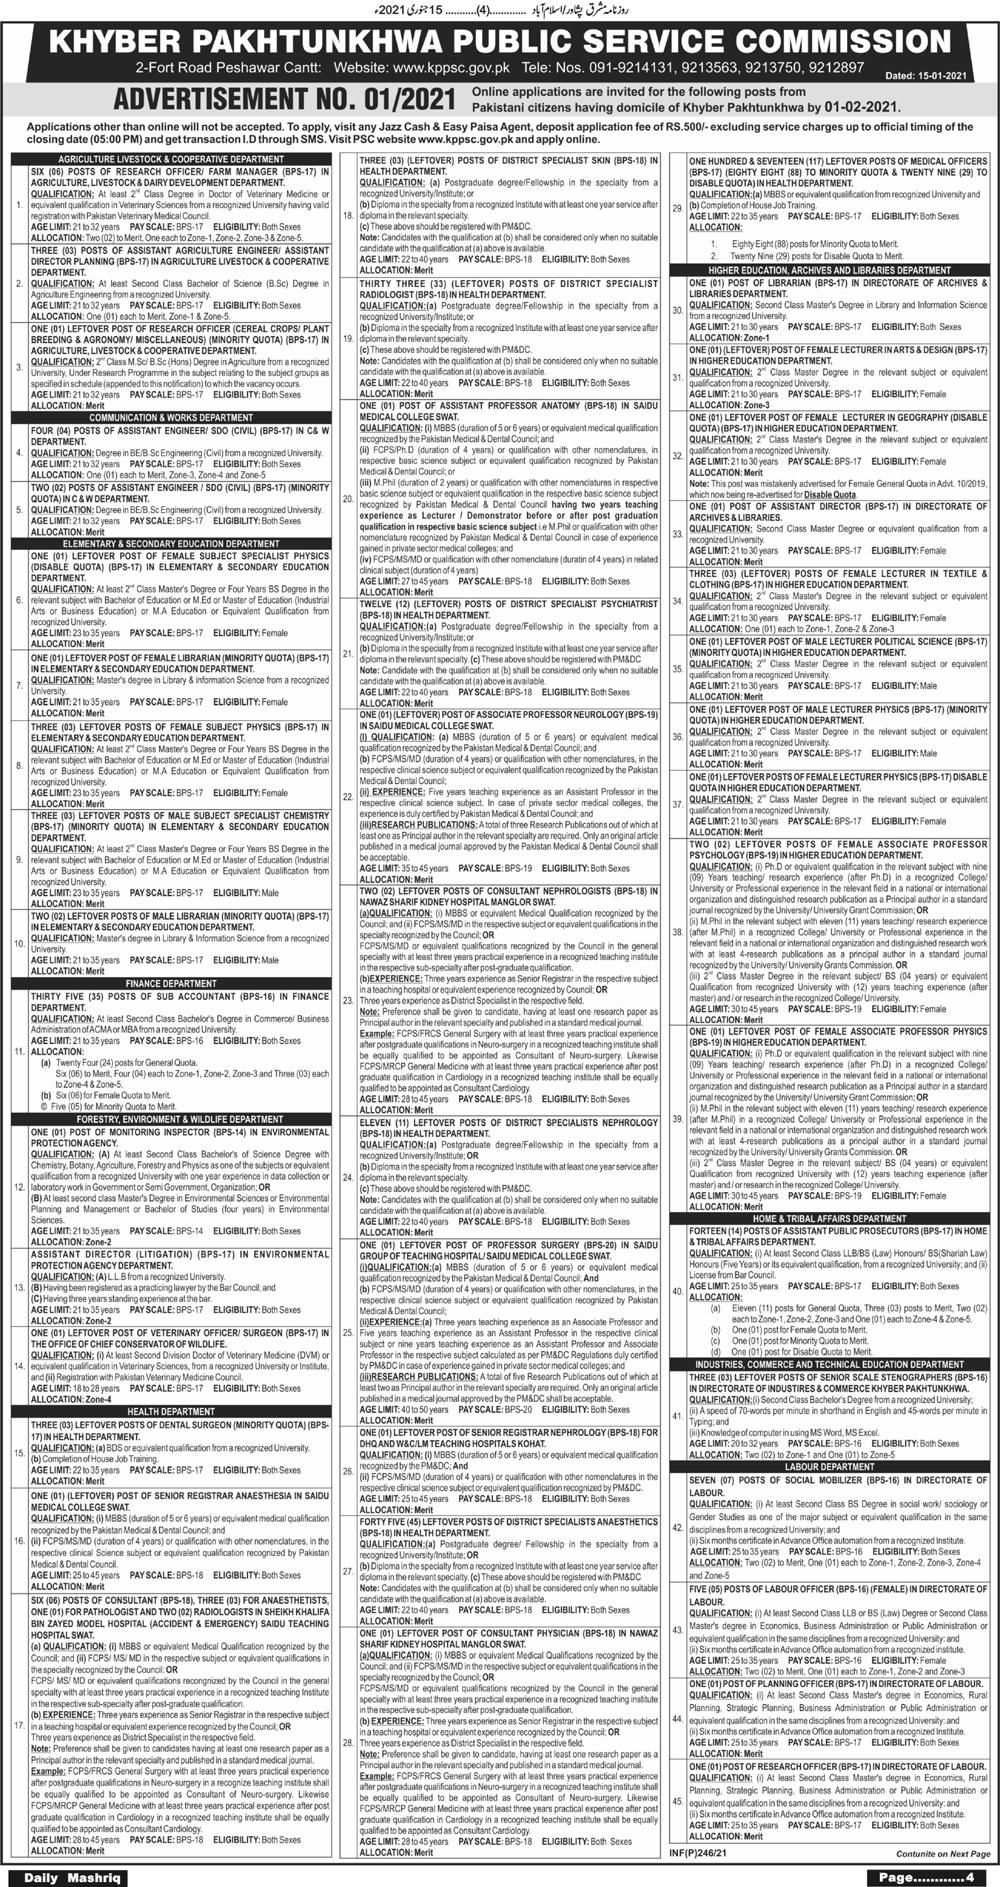 Latest Govt Jobs 2021 - Khyber Pakhtunkhwa Public Service Commission Jobs 2021 - KPPSC Jobs 2021 - Online Apply - www.kppsc.gov.pk